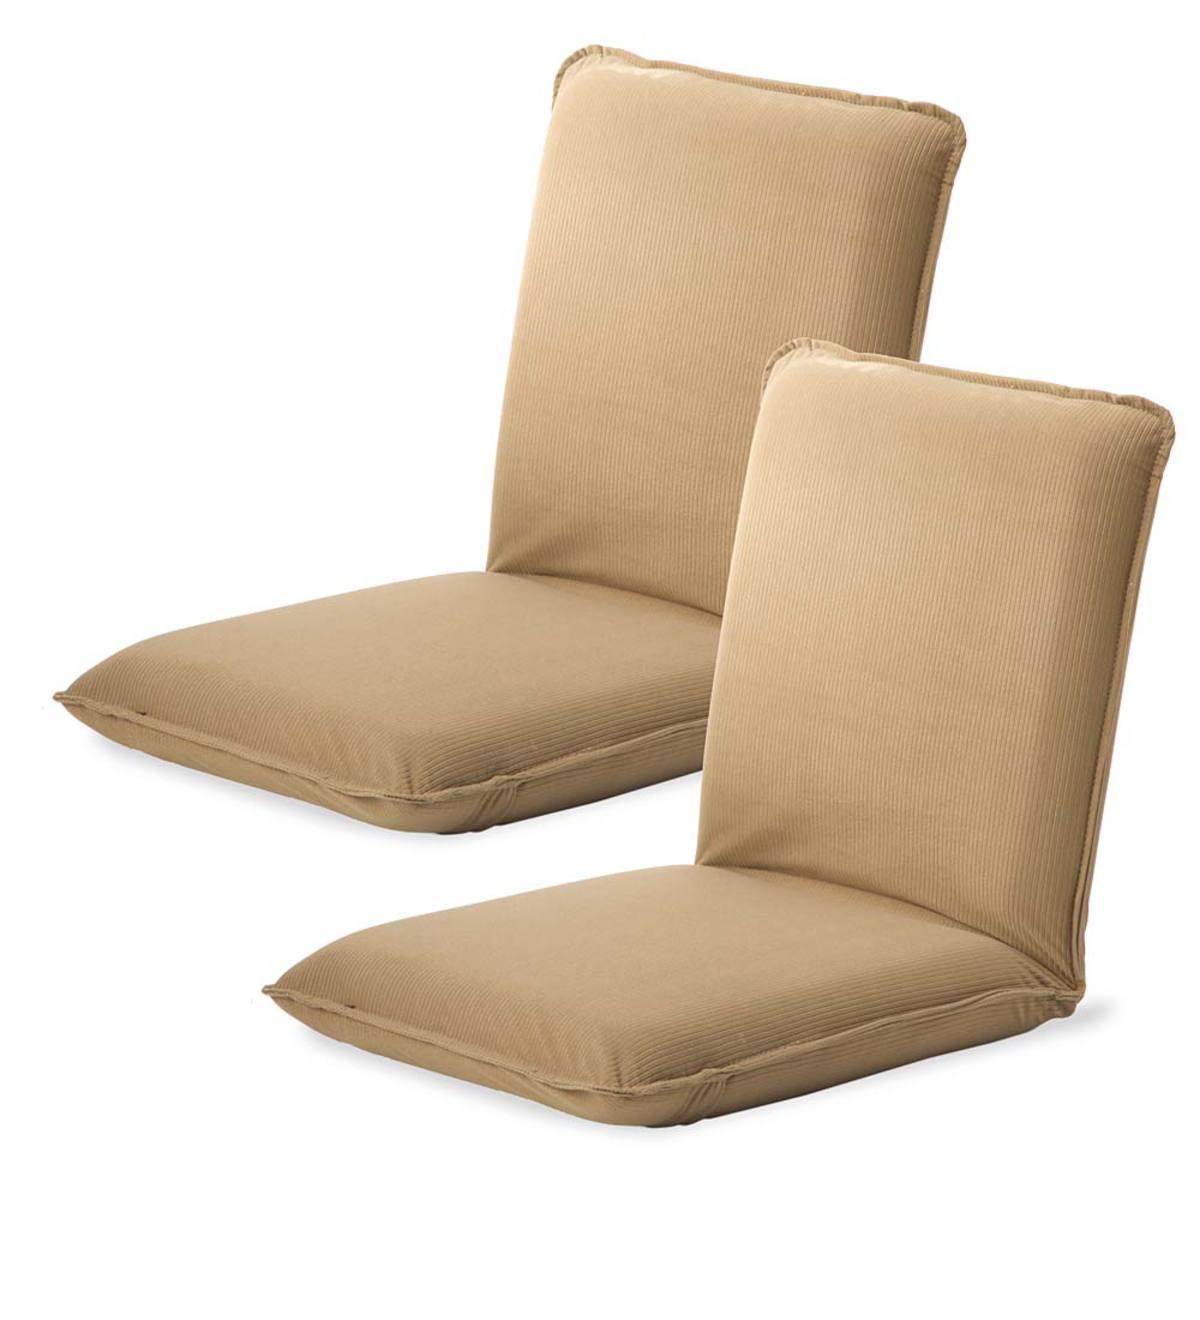 Multiangle Floor Chair With Adjustable Back Indoor